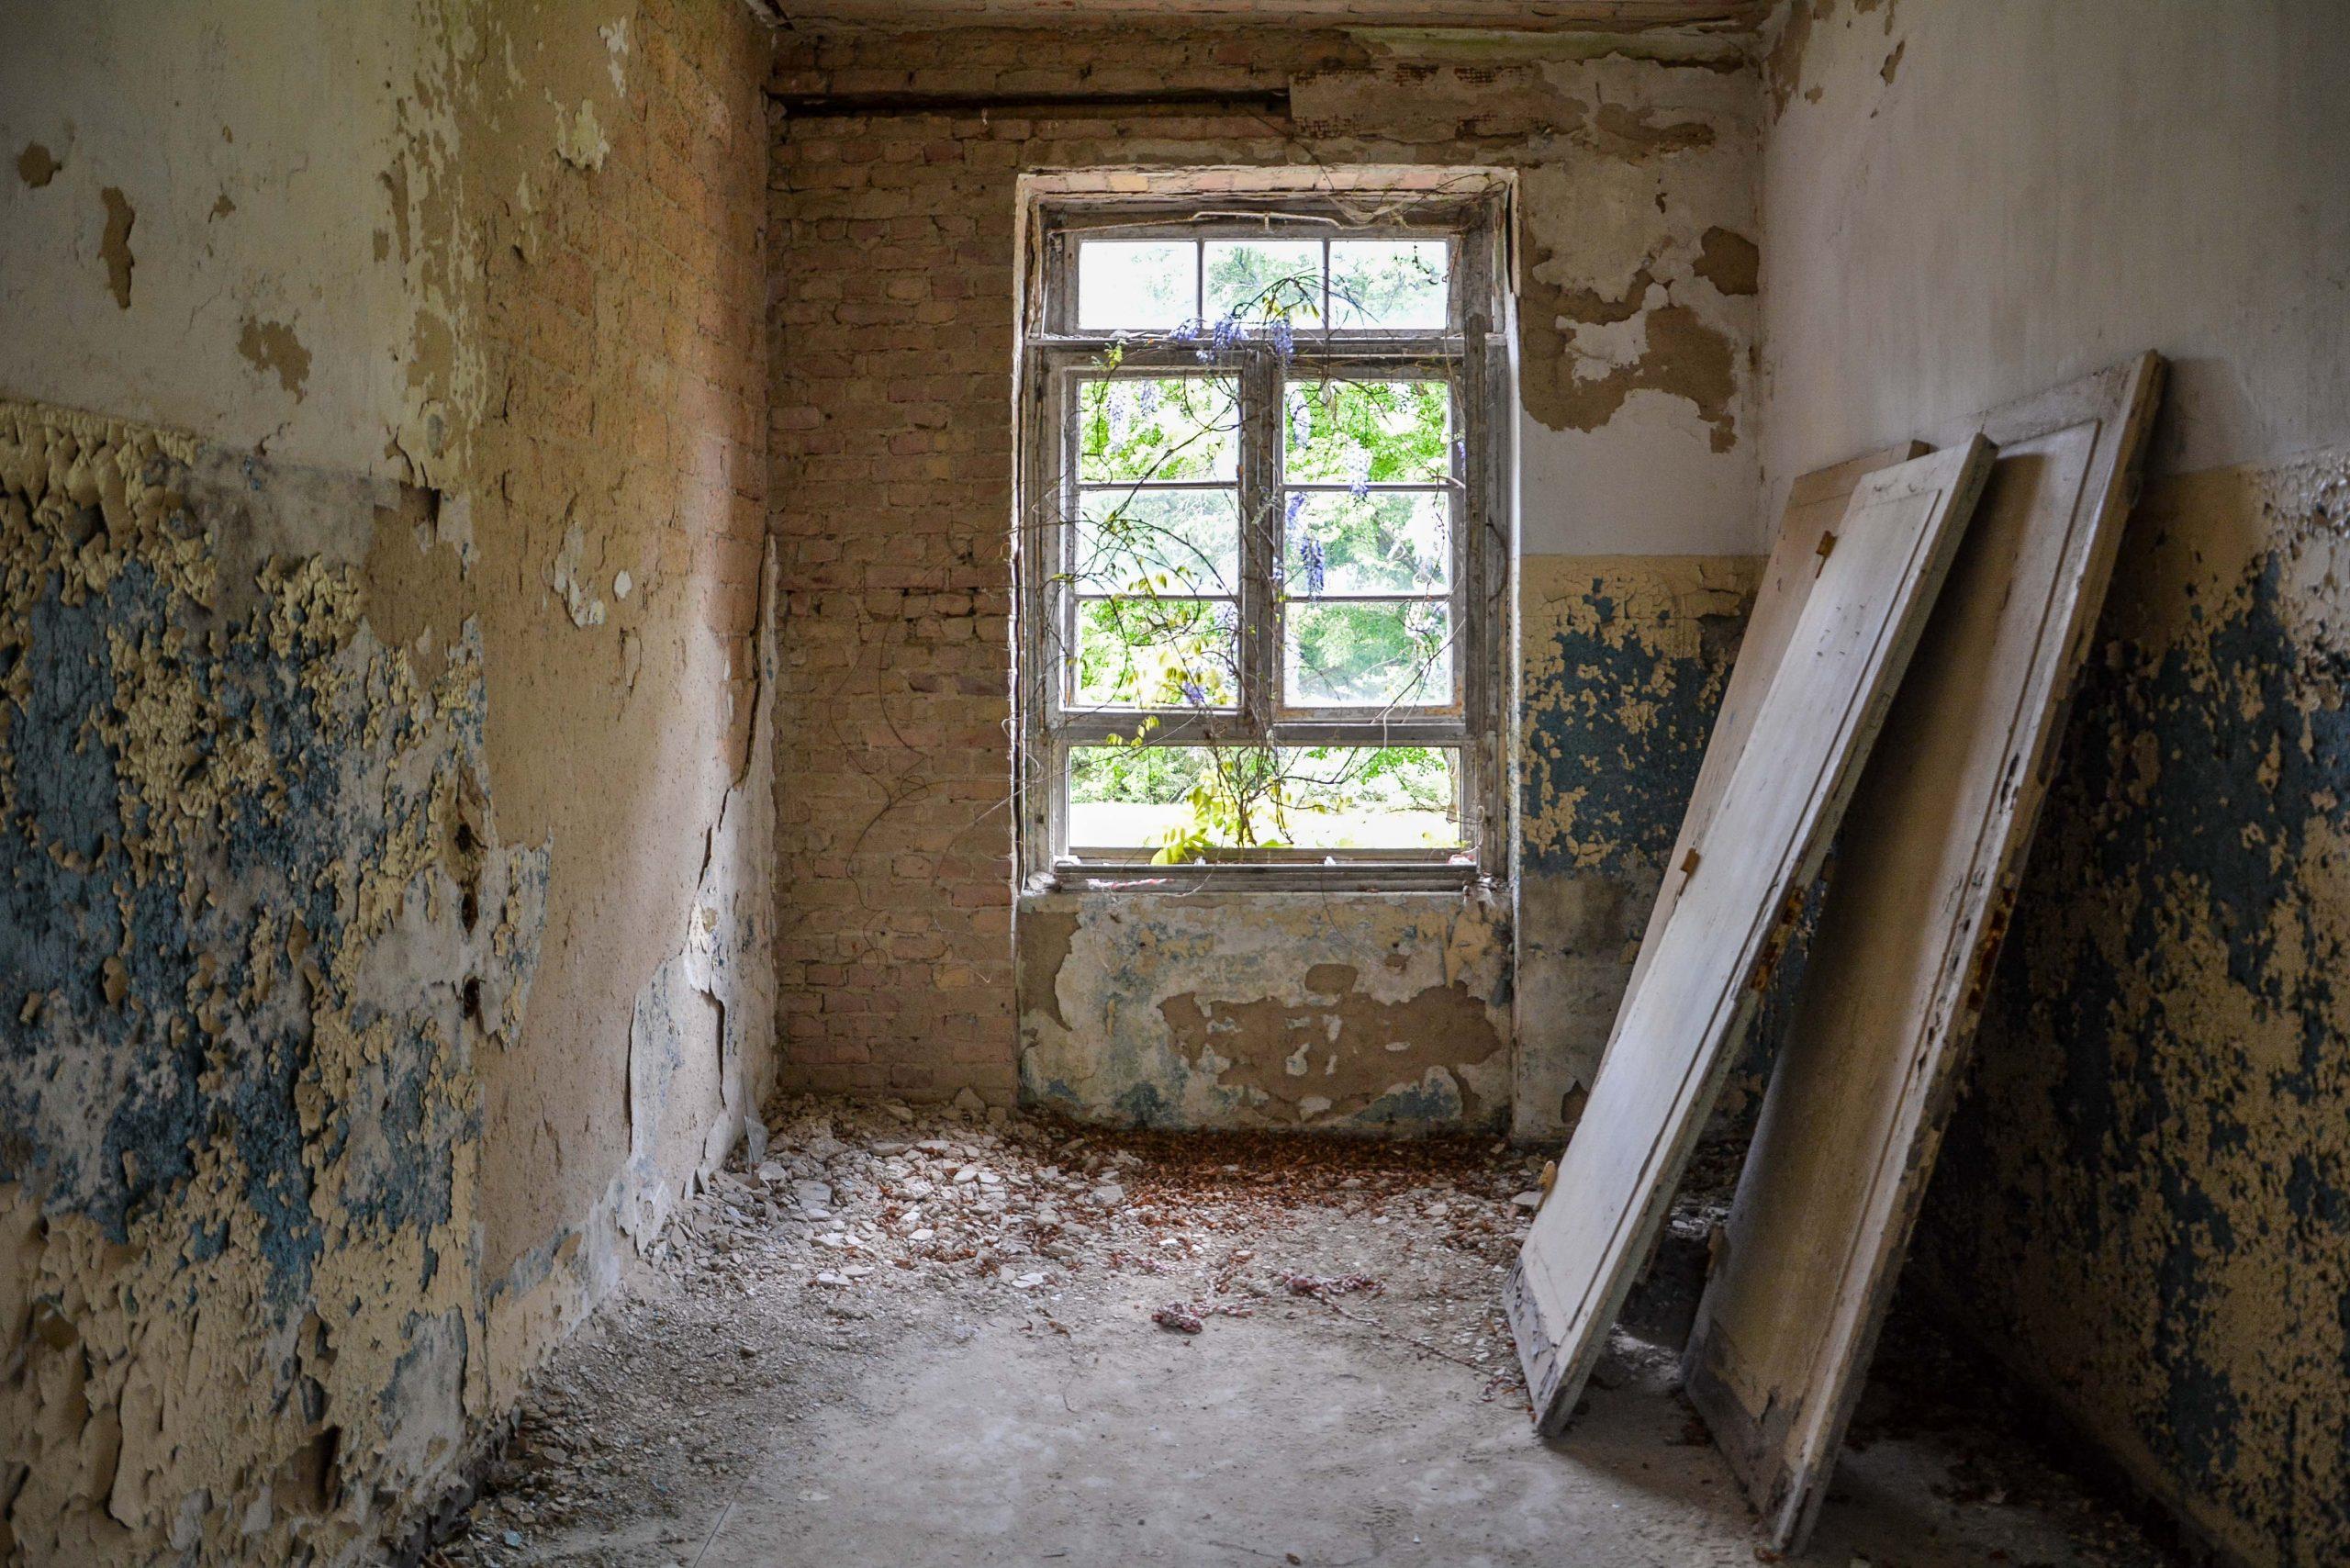 abandoned doors tuberkulose heilstaette grabowsee sanatorium hospital oranienburg lost places abandoned urbex brandenburg germany deutschland